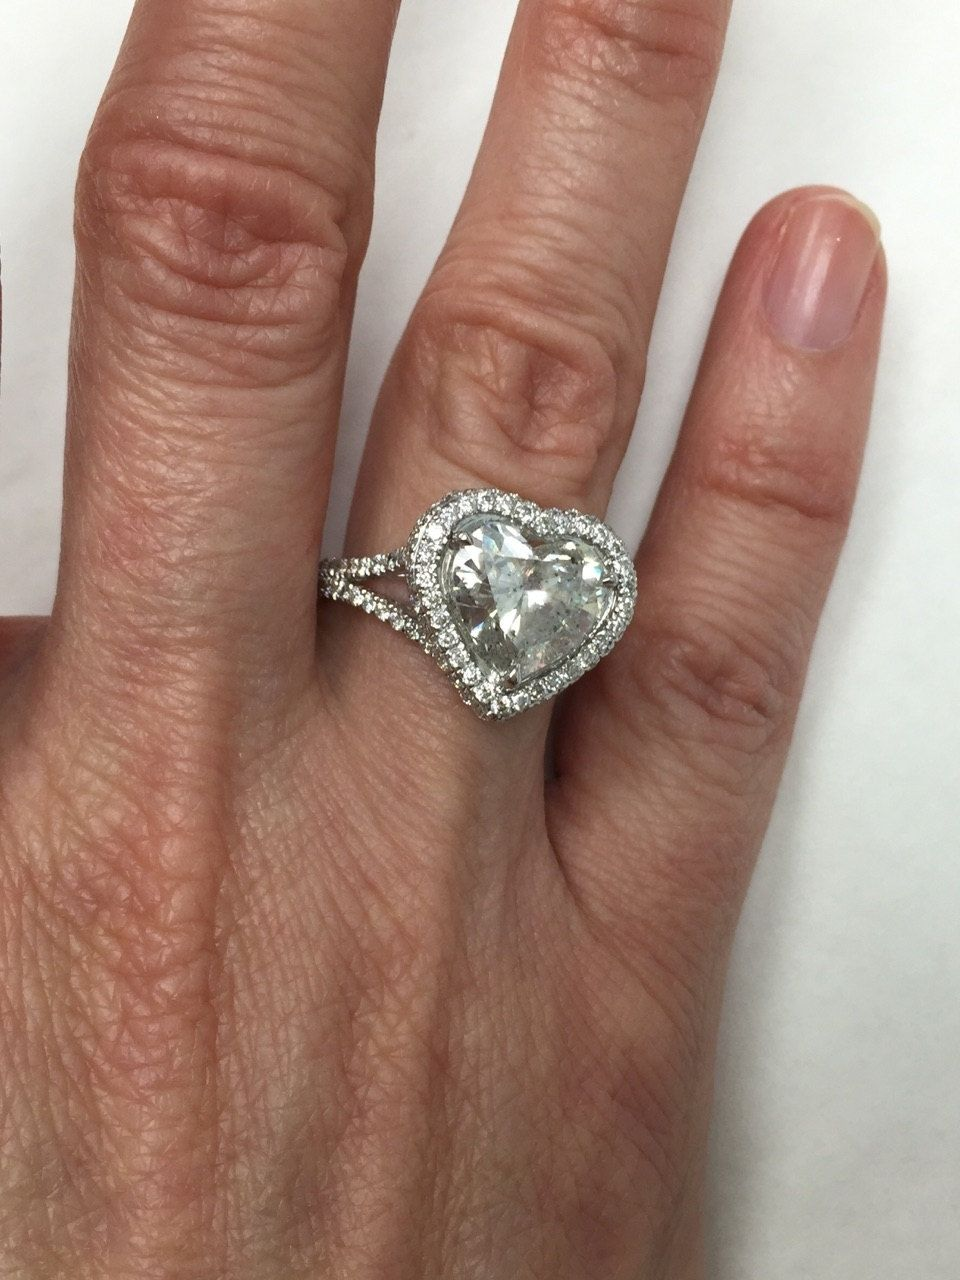 5 Carat Heart Shaped Diamond Ring Engagement Rings